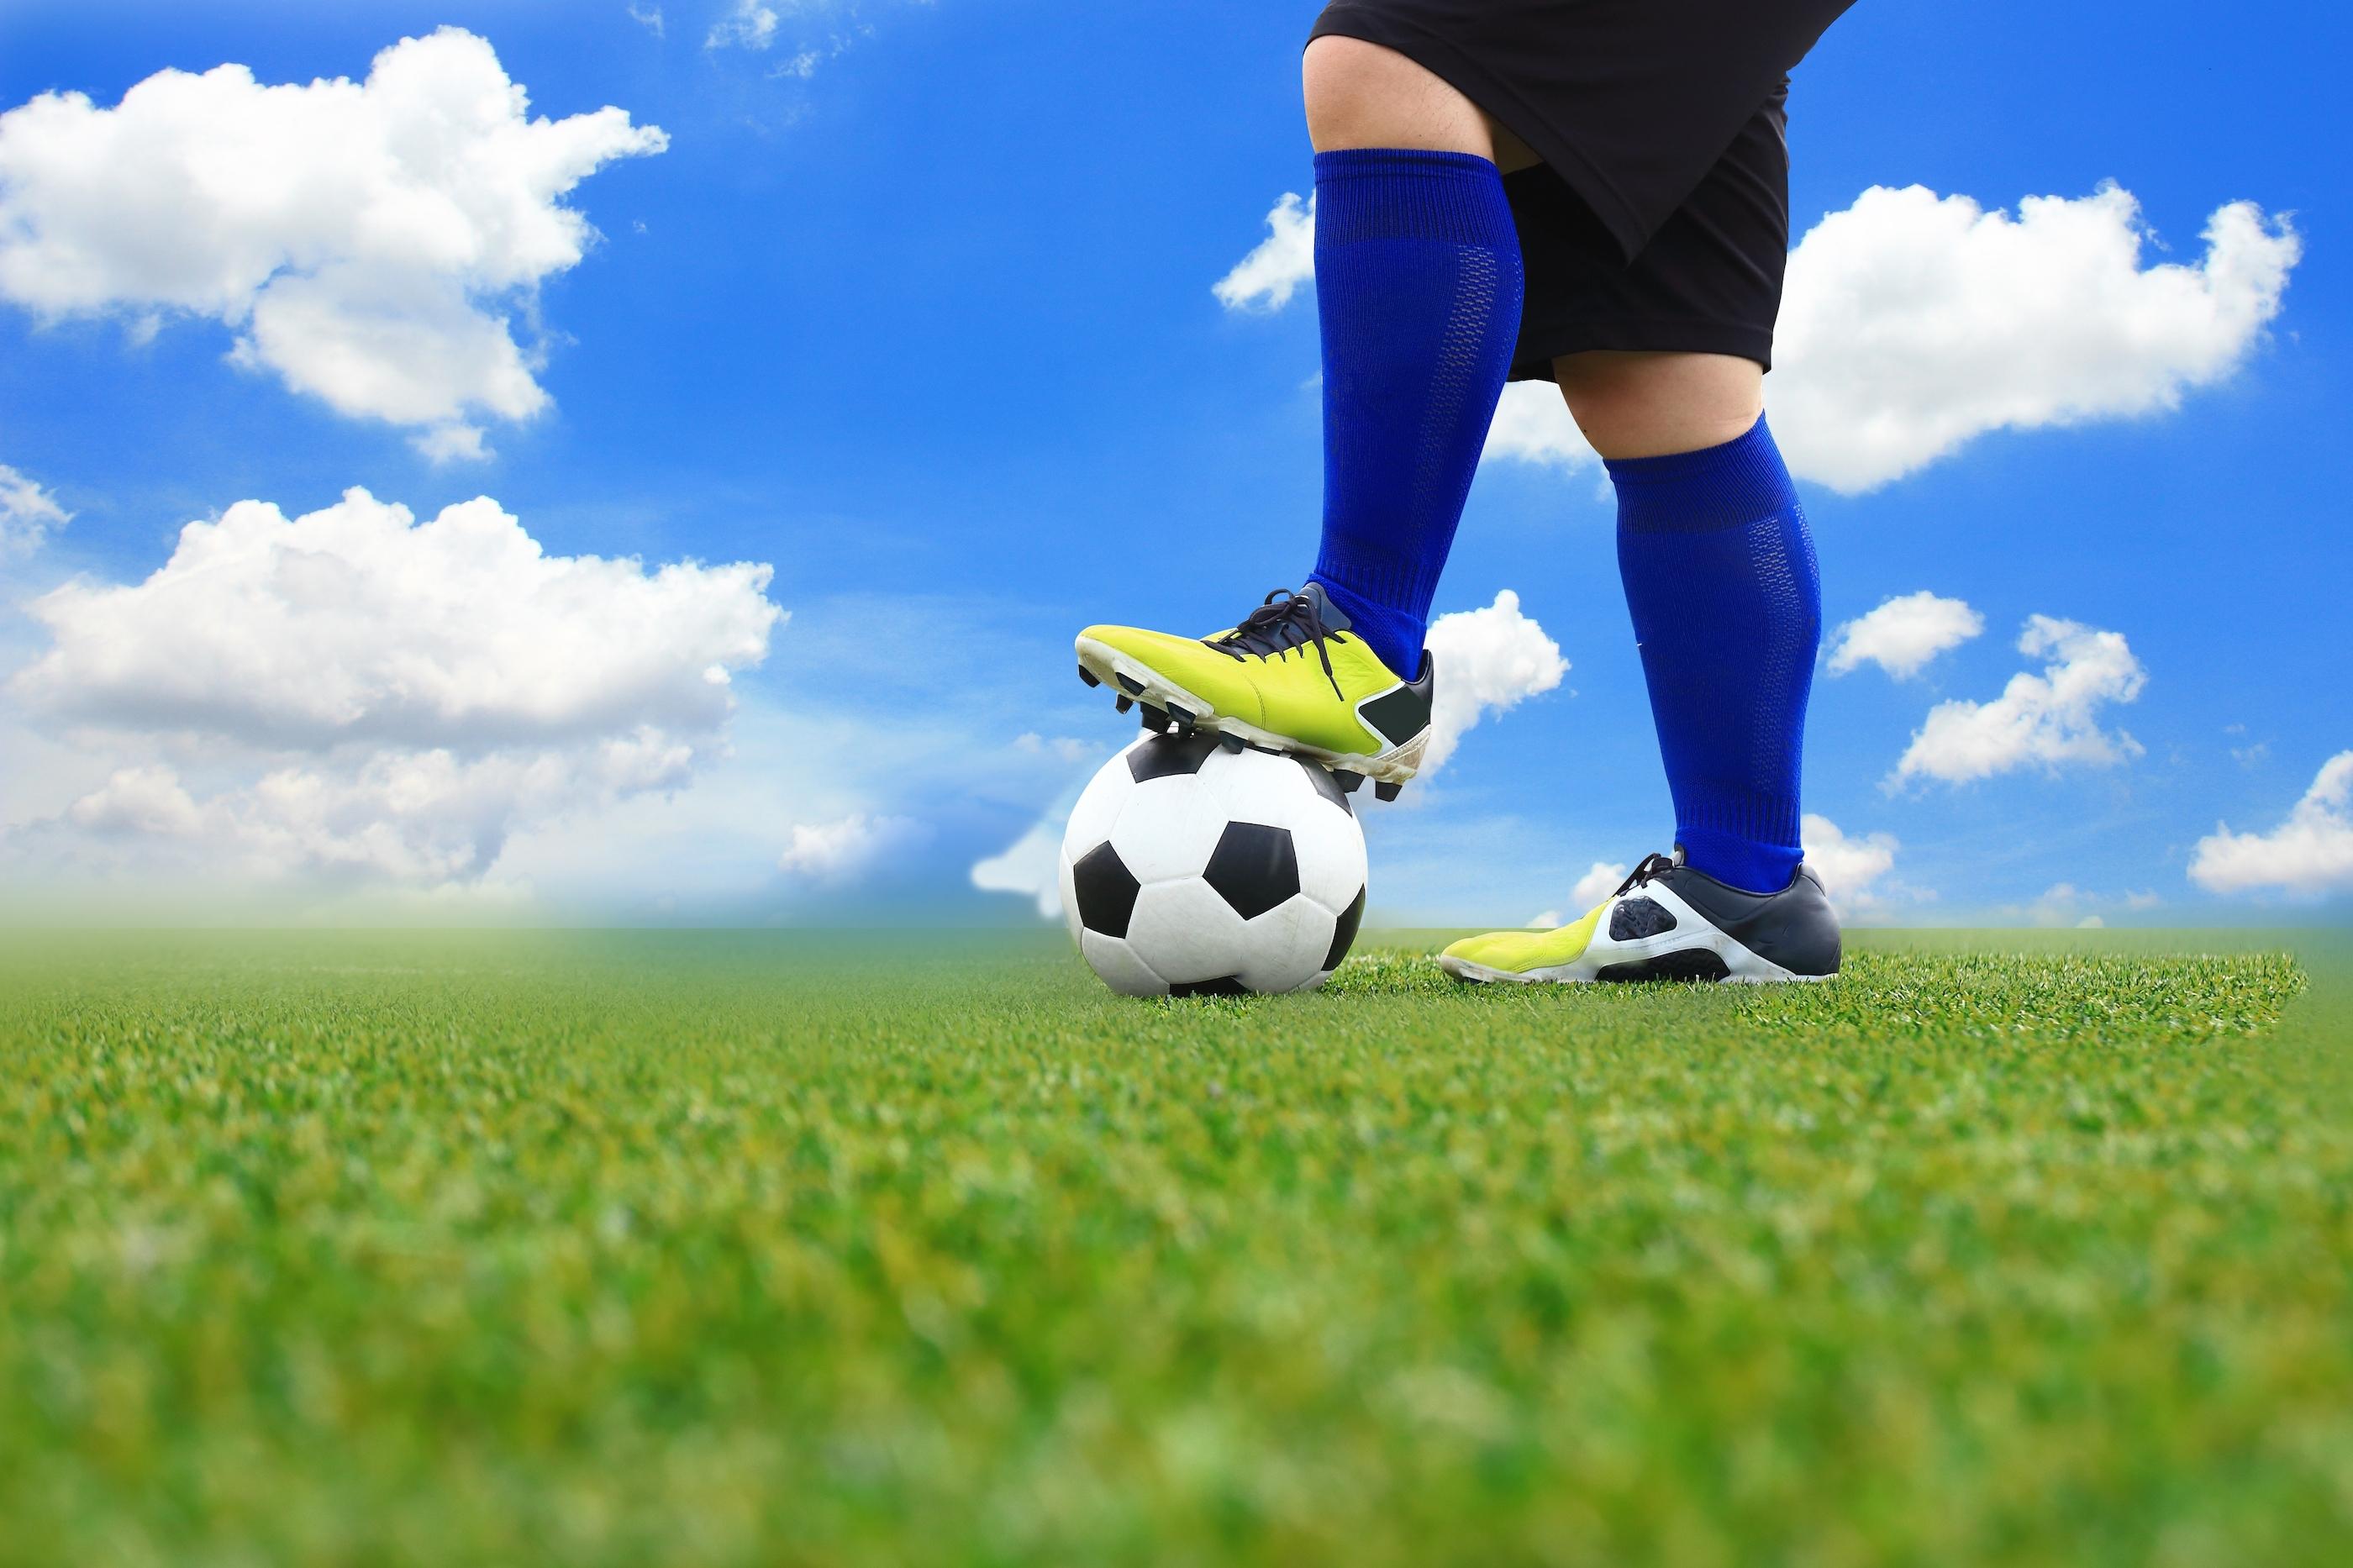 beef05f57bd7c19dea16_Soccer_5.jpg